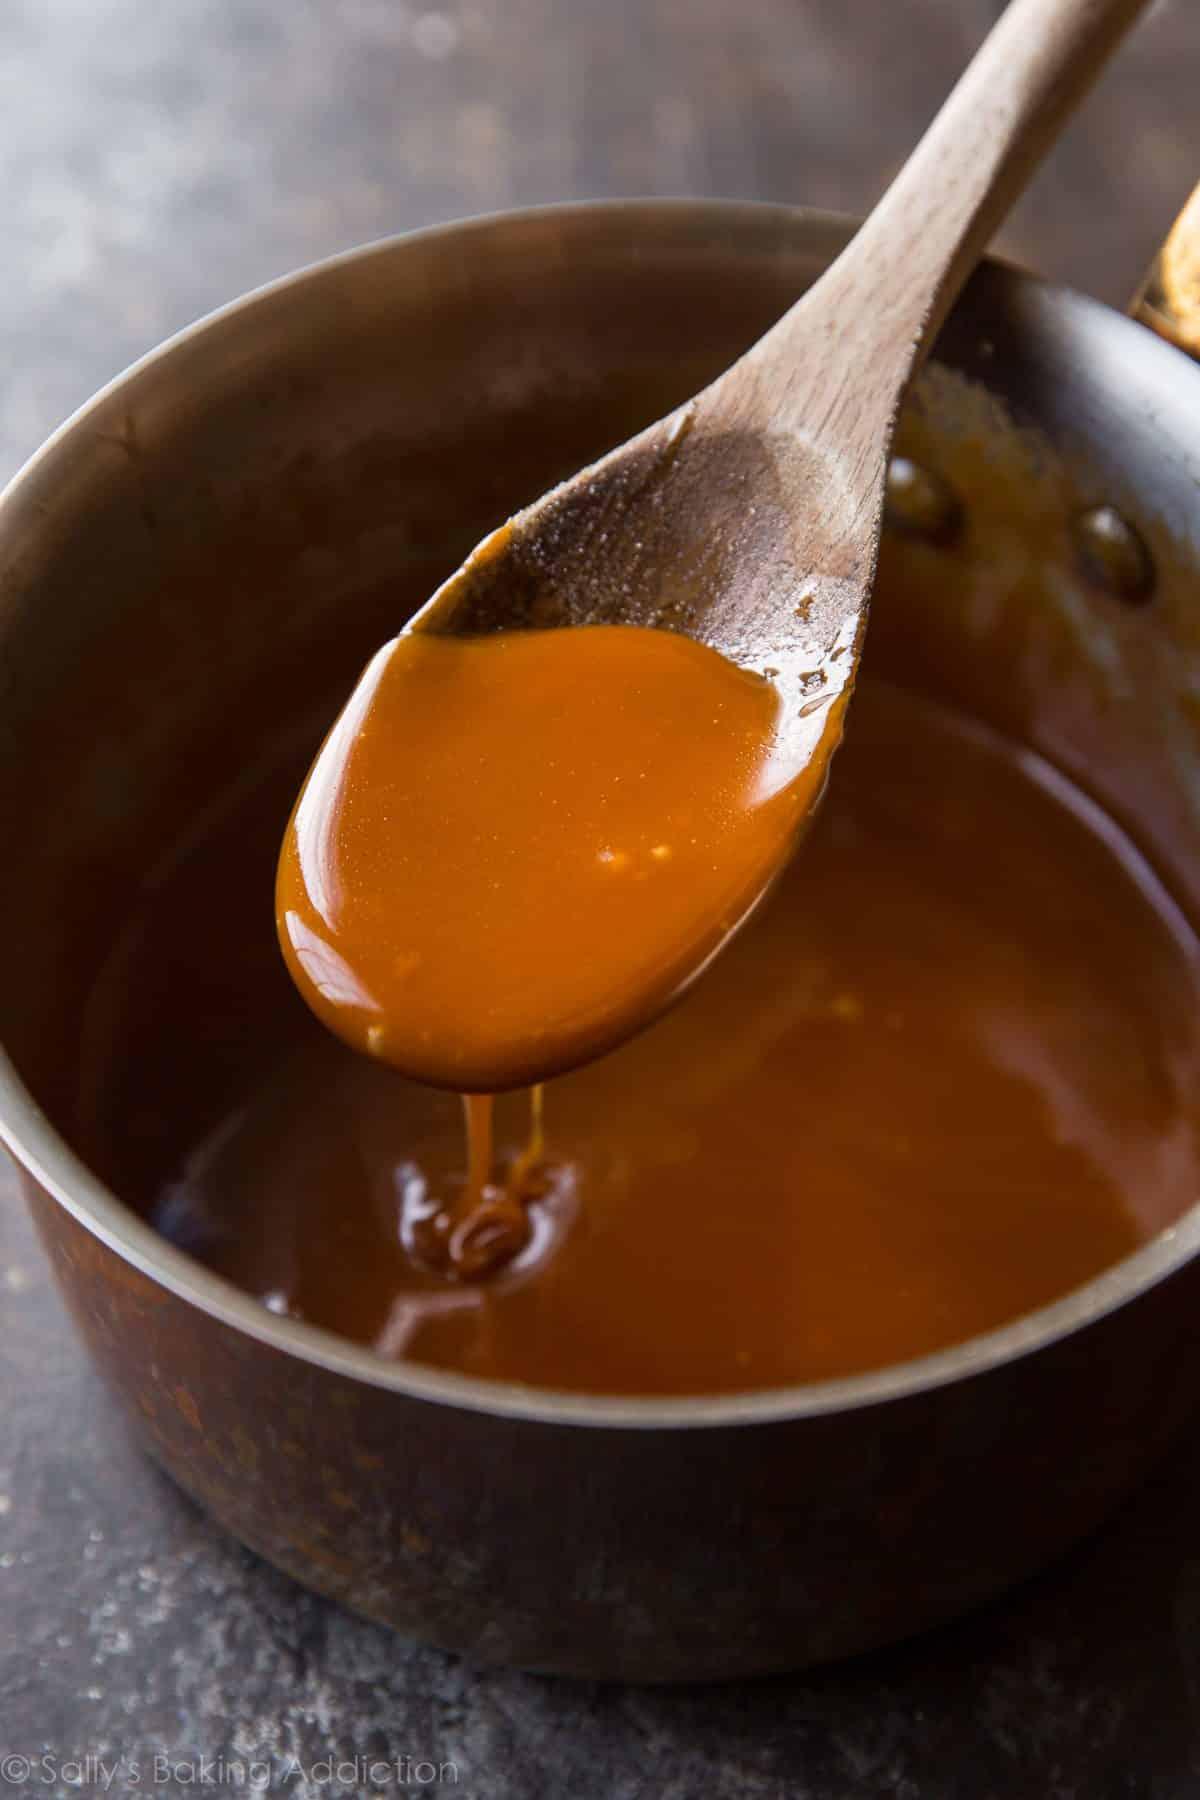 Homemade Salted Caramel Recipe Sallys Baking Addiction